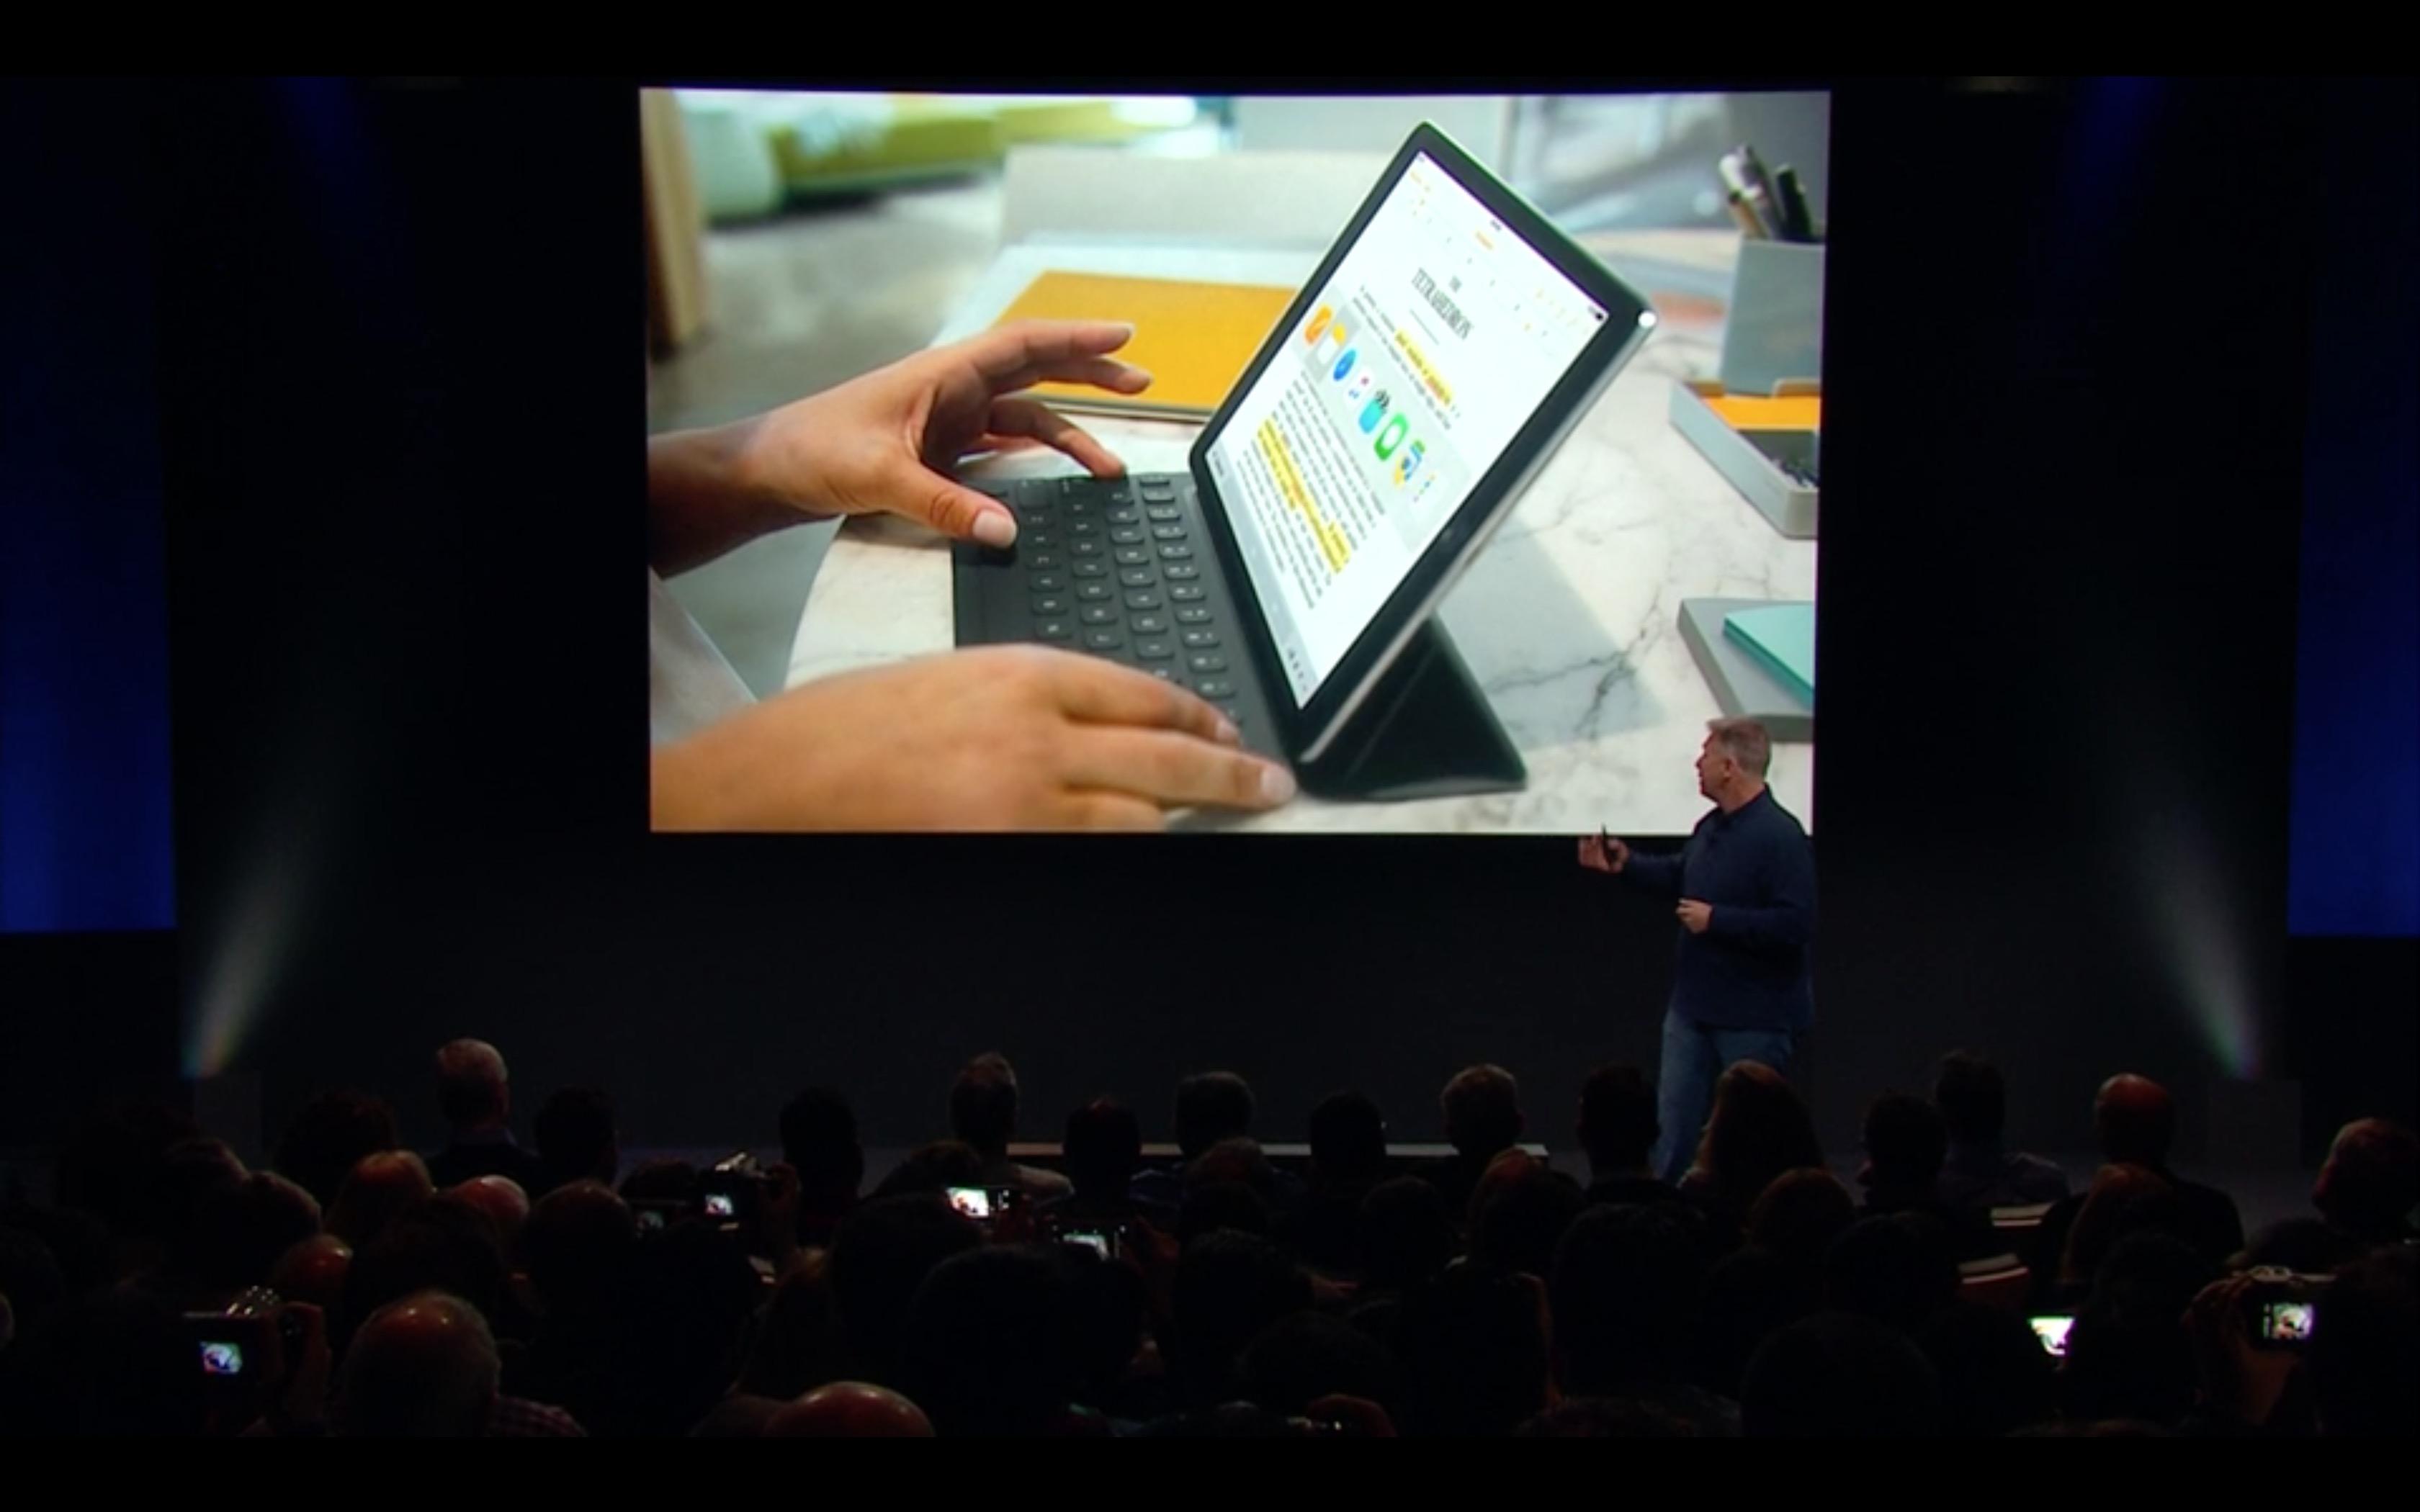 iPad Pro 9.7 pollici Smart Keyboard